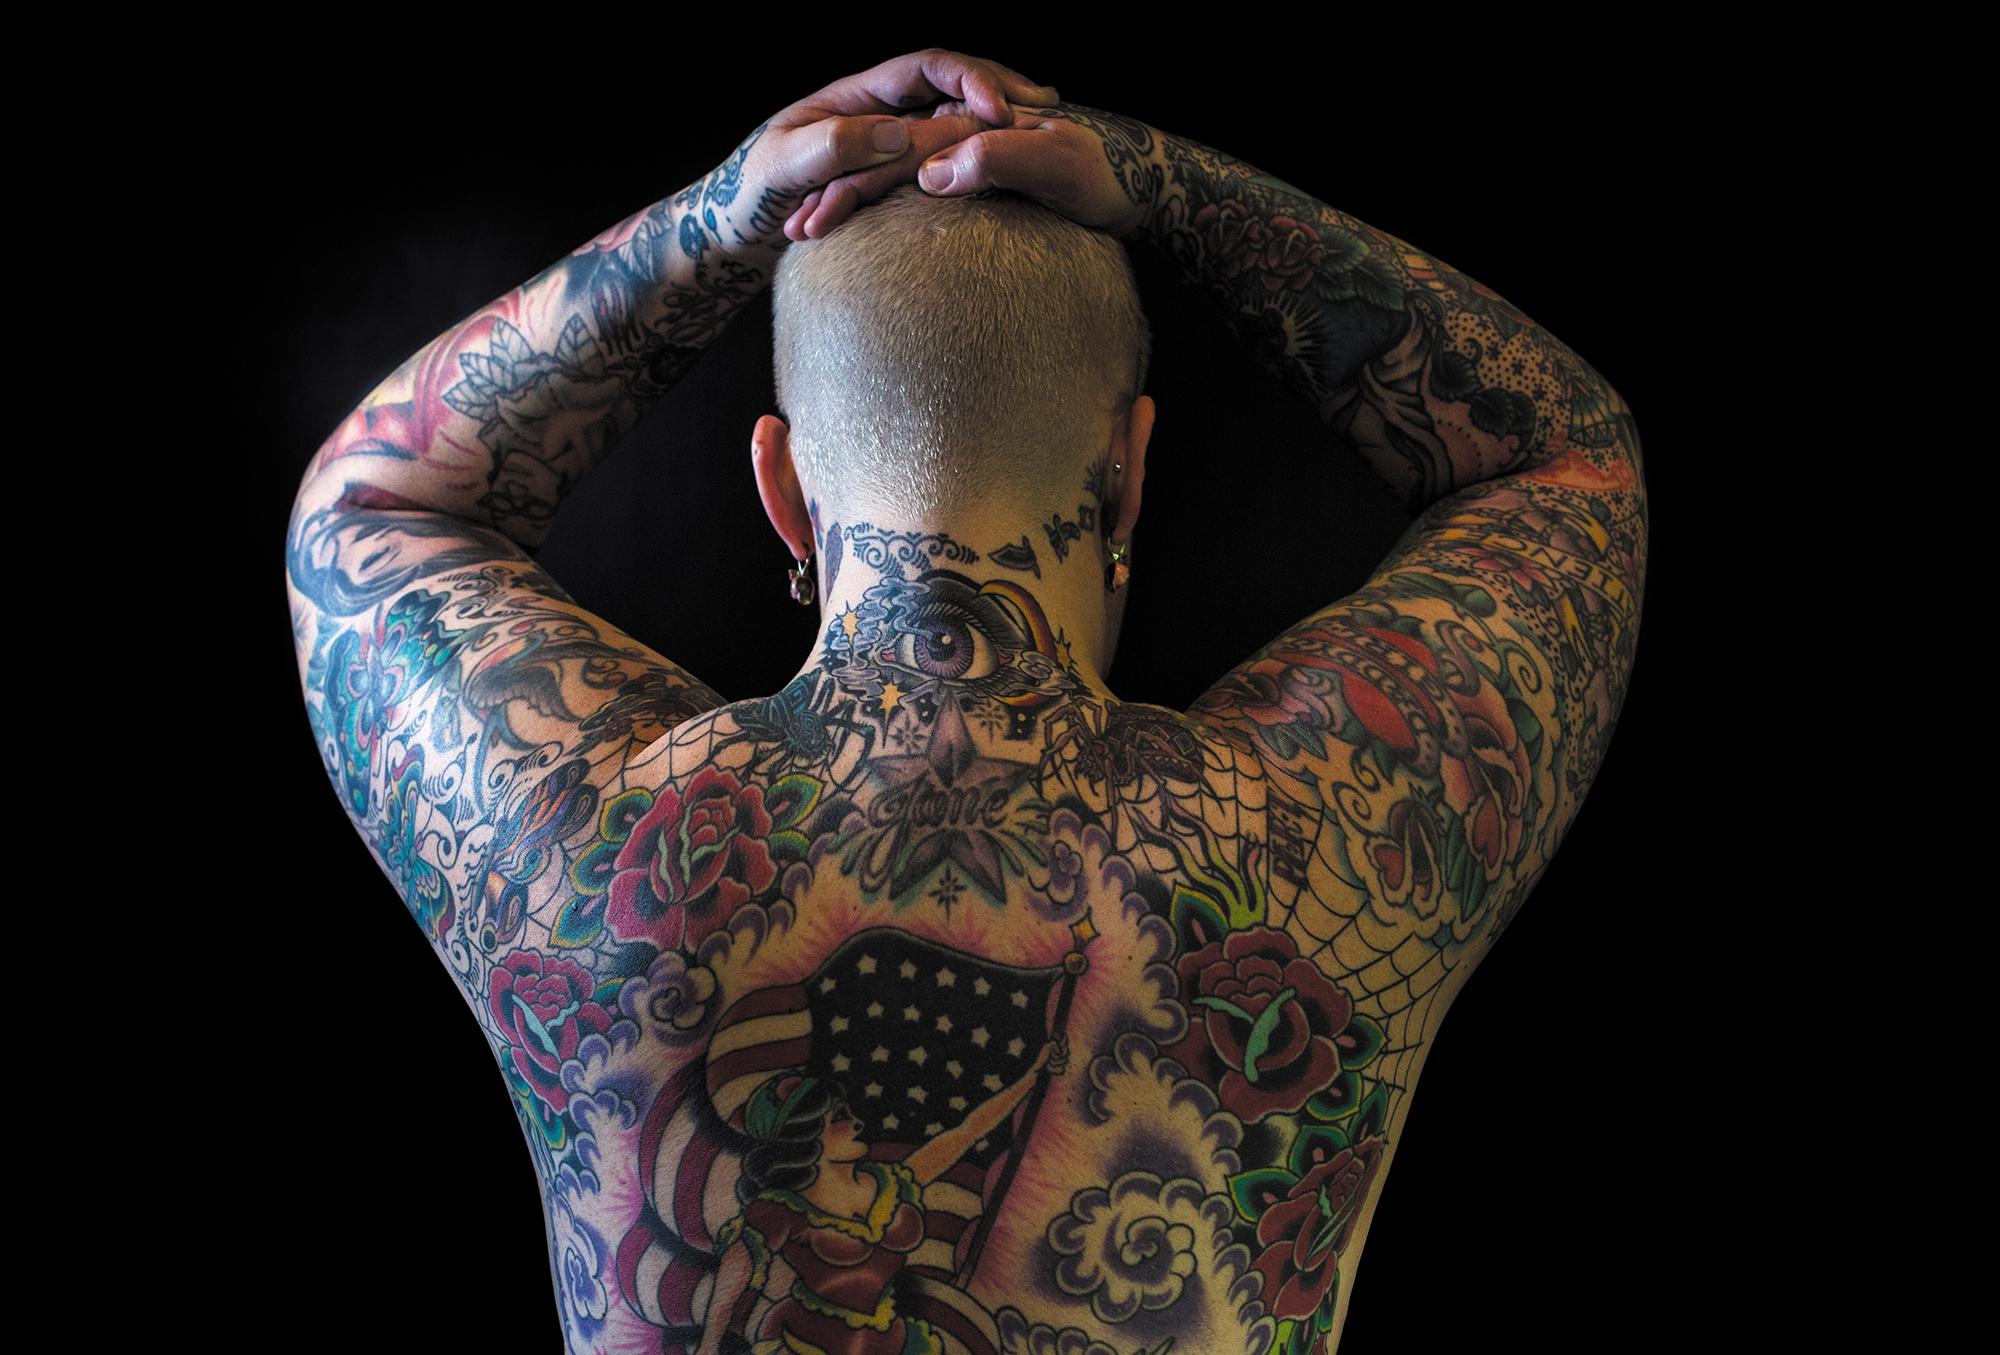 Tattoo art by Jud Ferguson